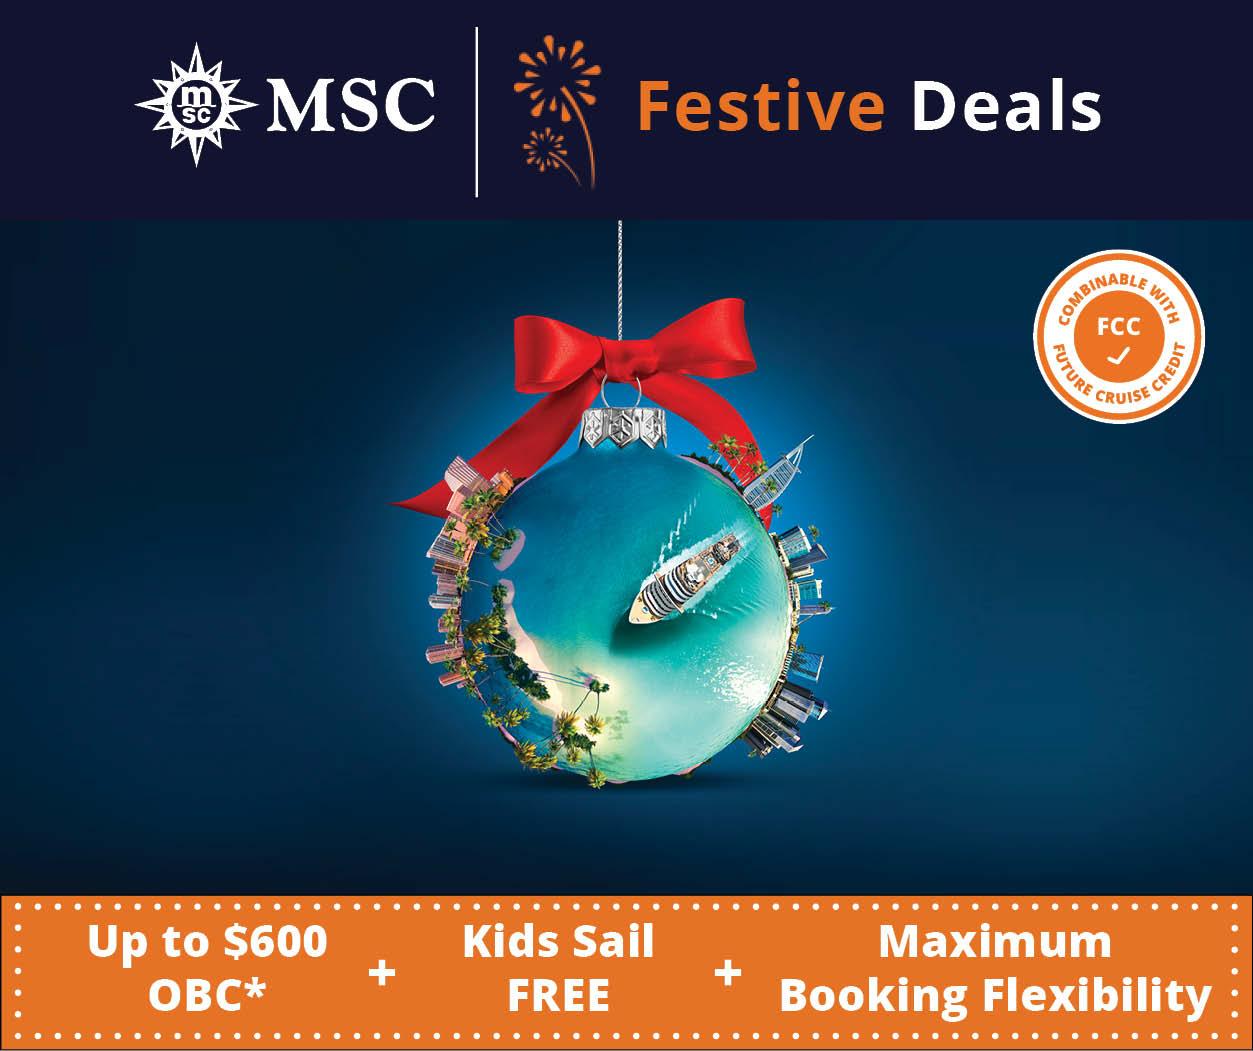 MSC Festive Deals